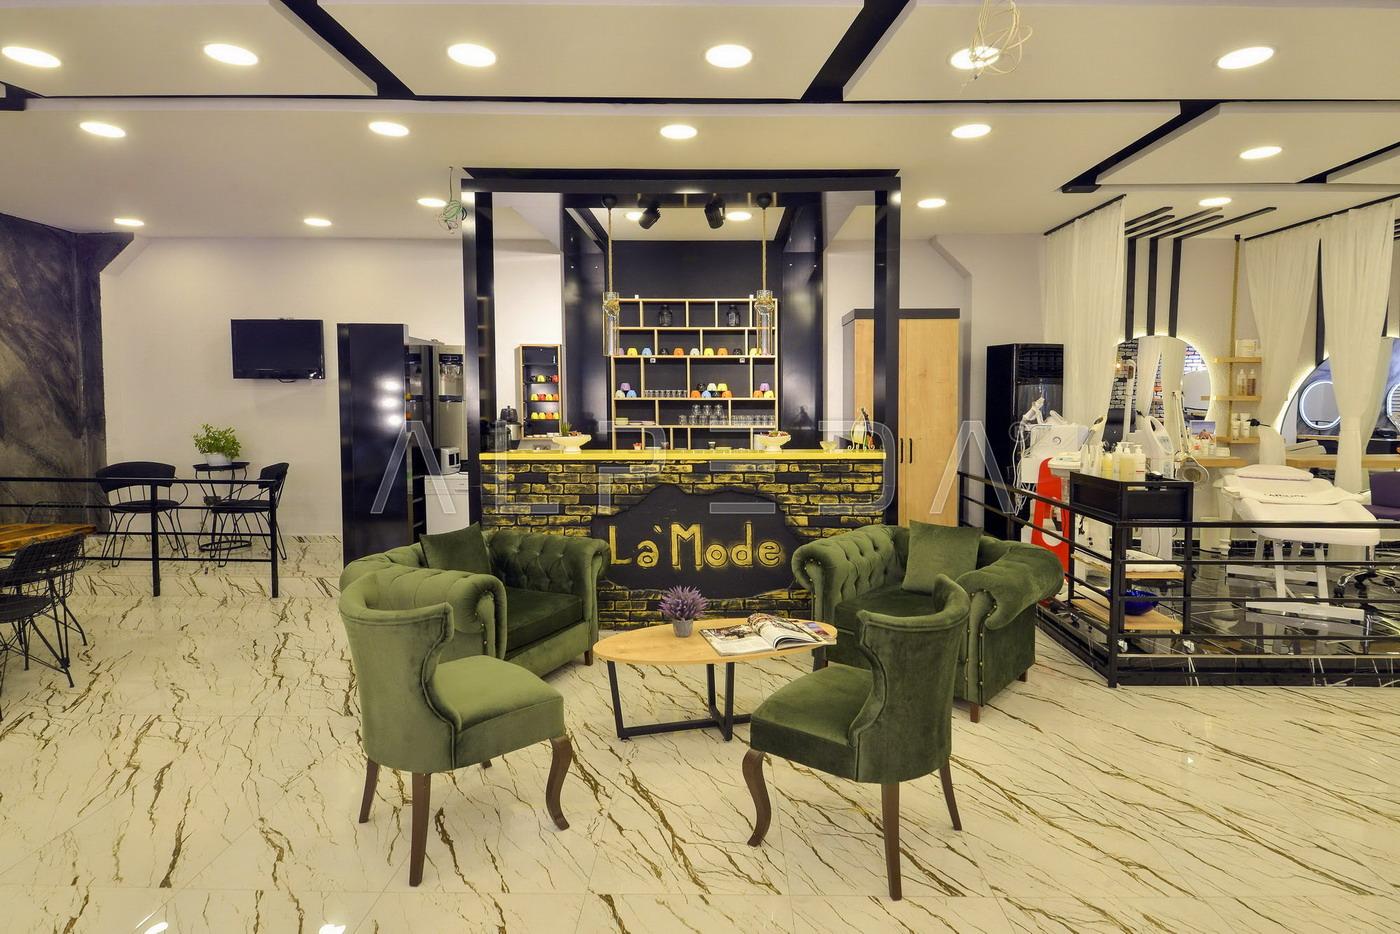 Ankara - La Mode Güzellik Salonu